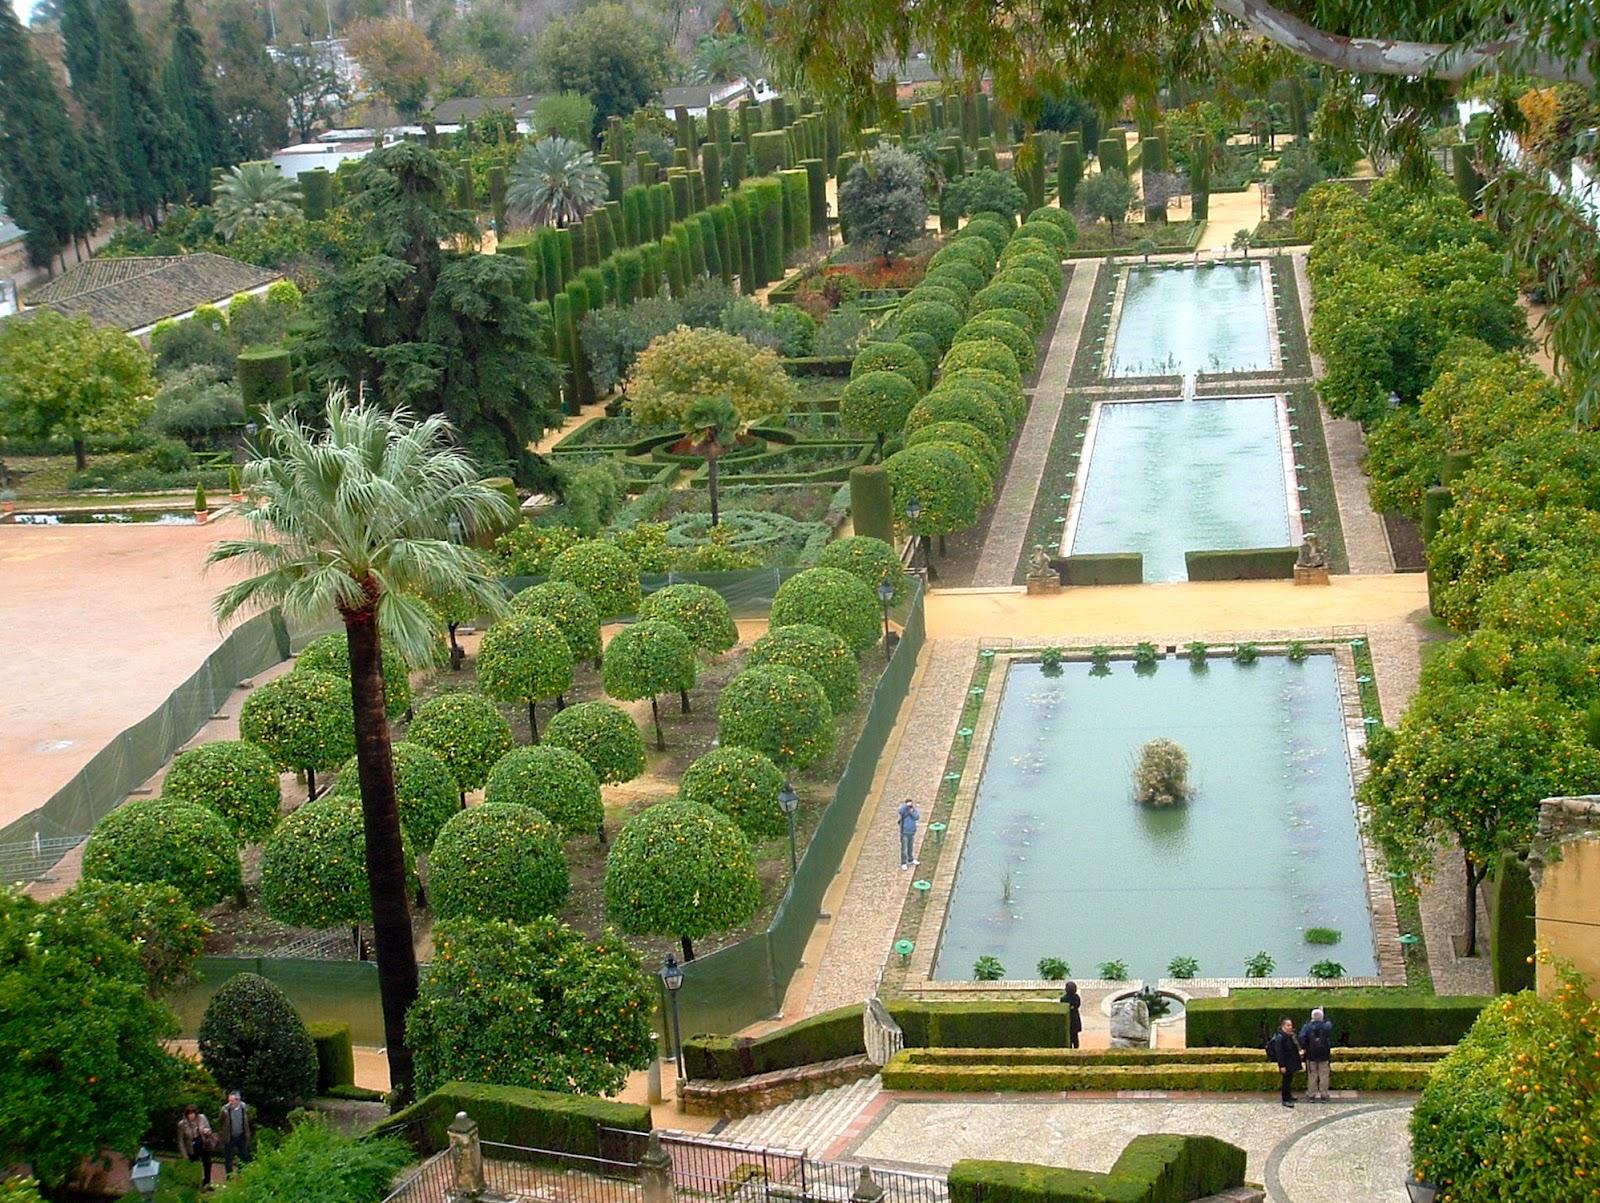 Arq de paisaje facultad de arquitectura unam - Jardines verticales sevilla ...